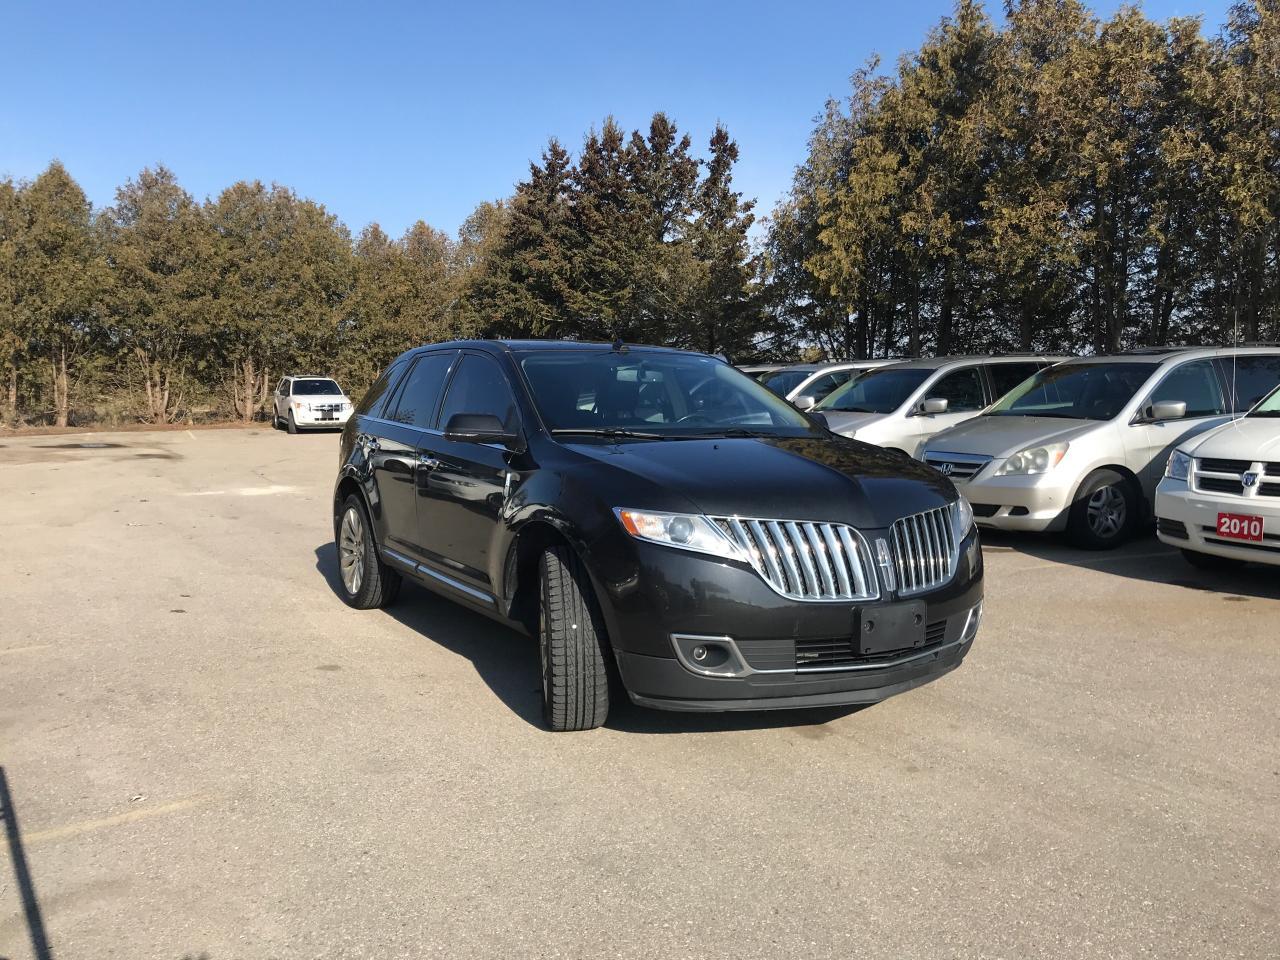 2013 Lincoln MKX Plus $200